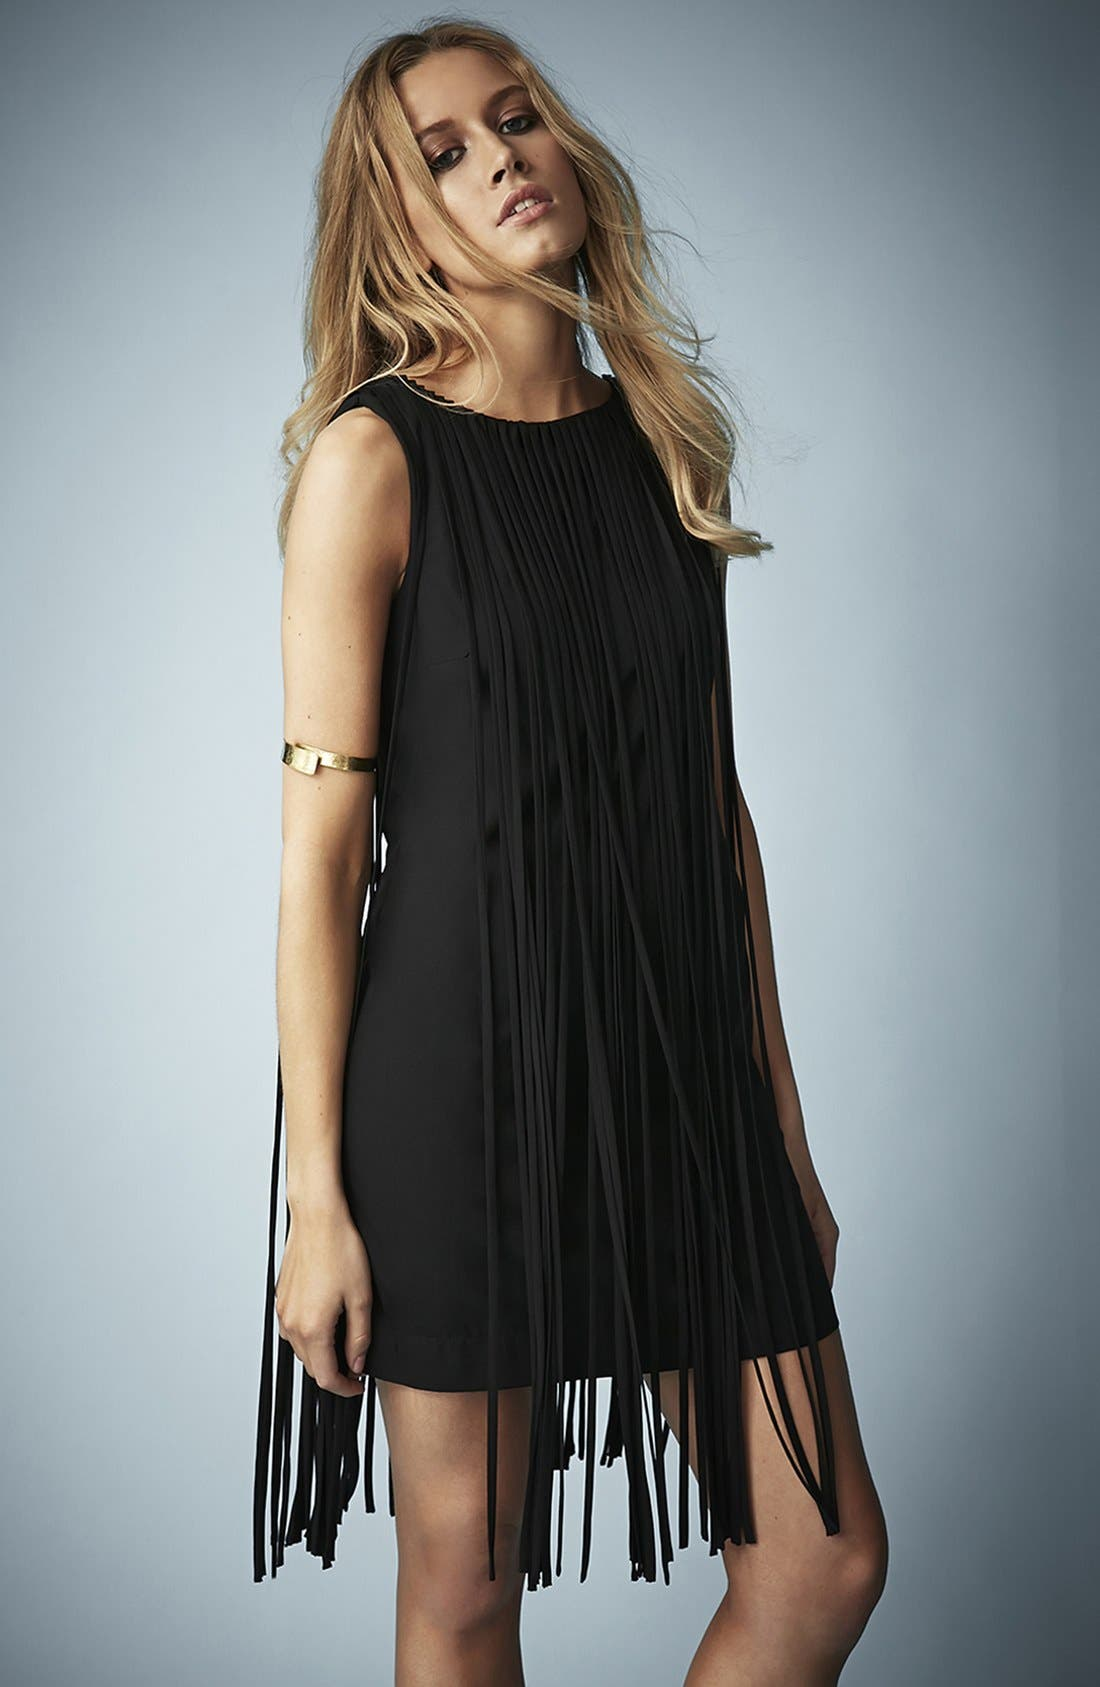 Alternate Image 1 Selected - Kate Moss for Topshop Long Fringed Tassel Dress